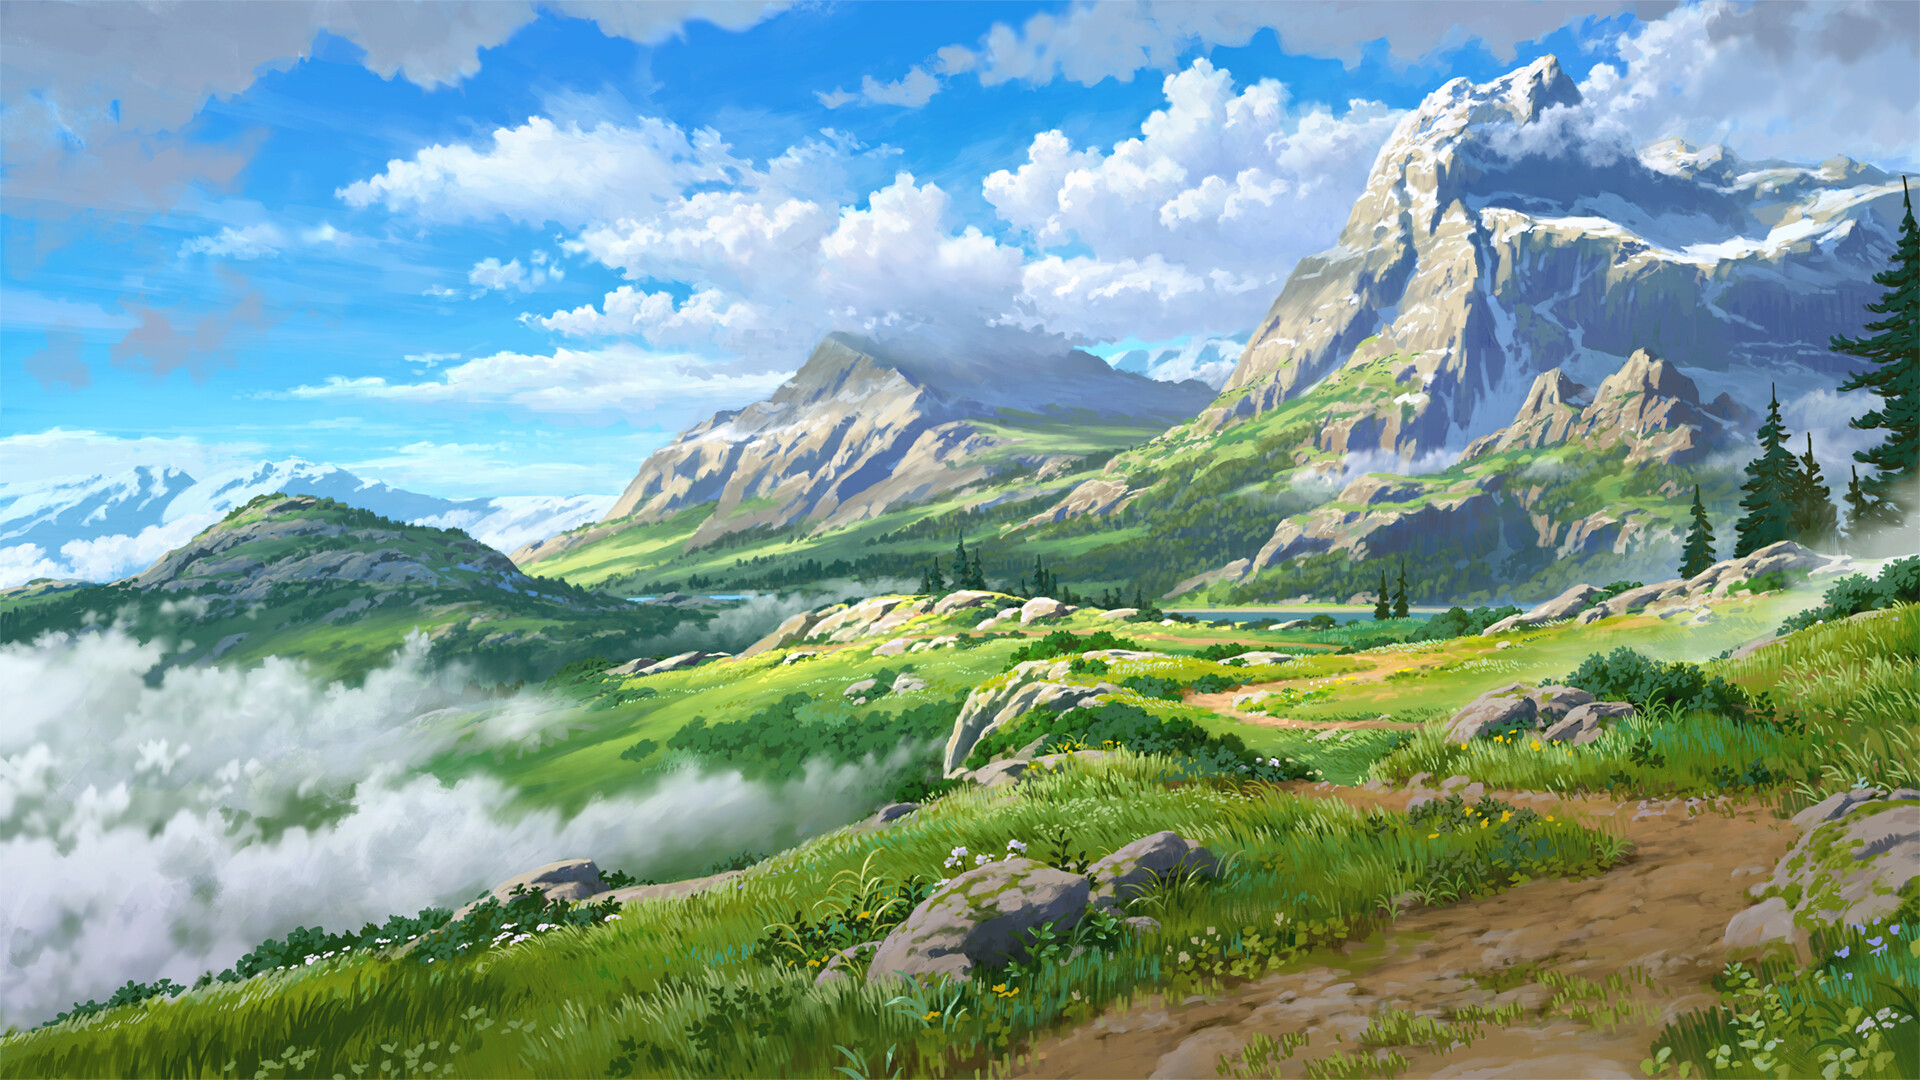 Anime 1920x1080 artwork digital art nature mountains path landscape grass